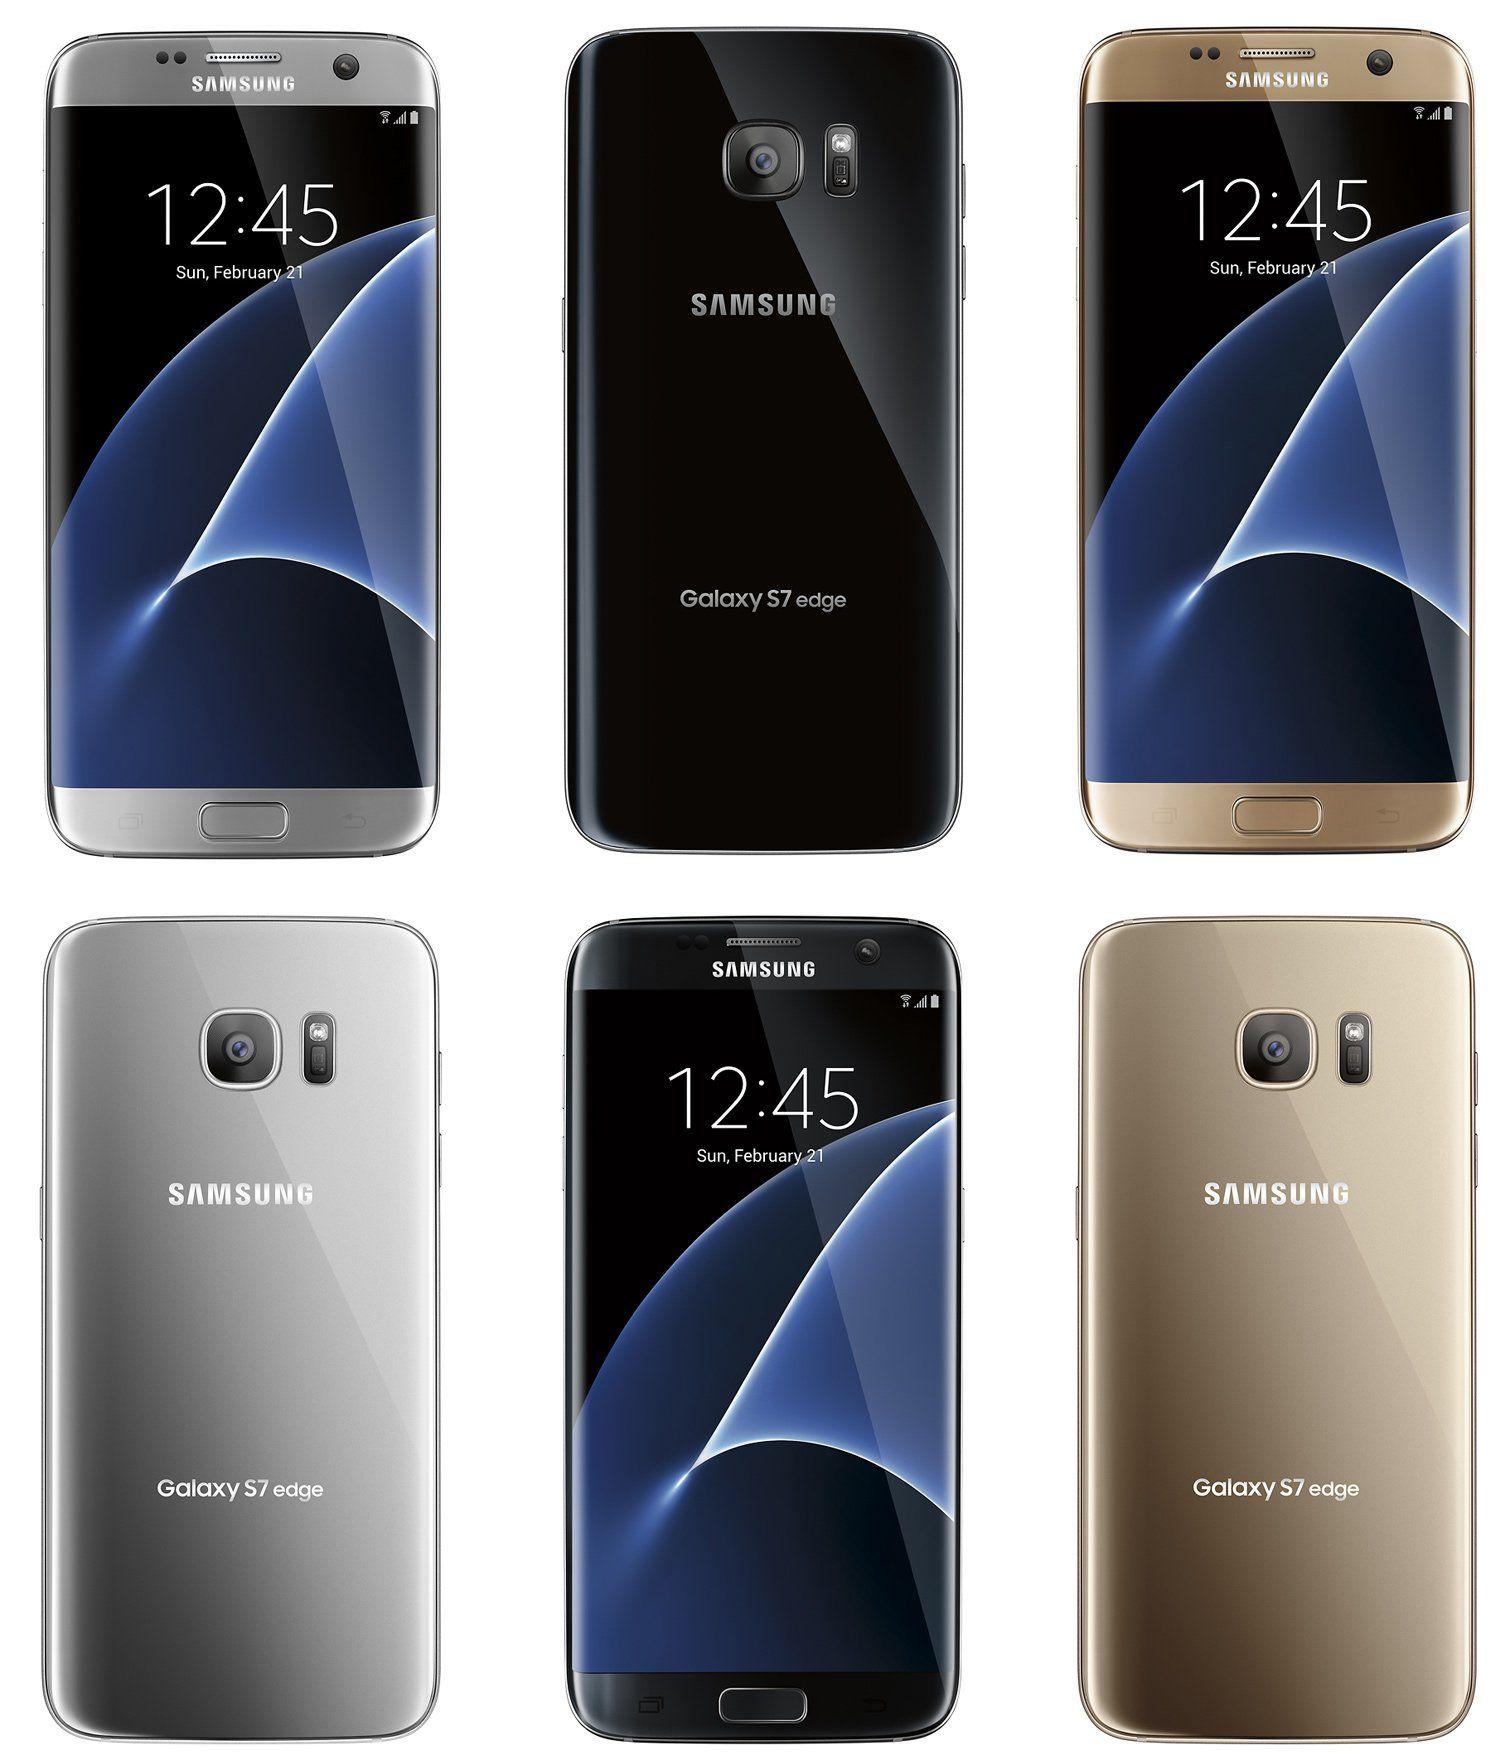 Samsung Galaxy S7 S7 Edge Renders Leak Again Samsung Galaxy S7 Samsung Galaxy Samsung Galaxy S7 Edge